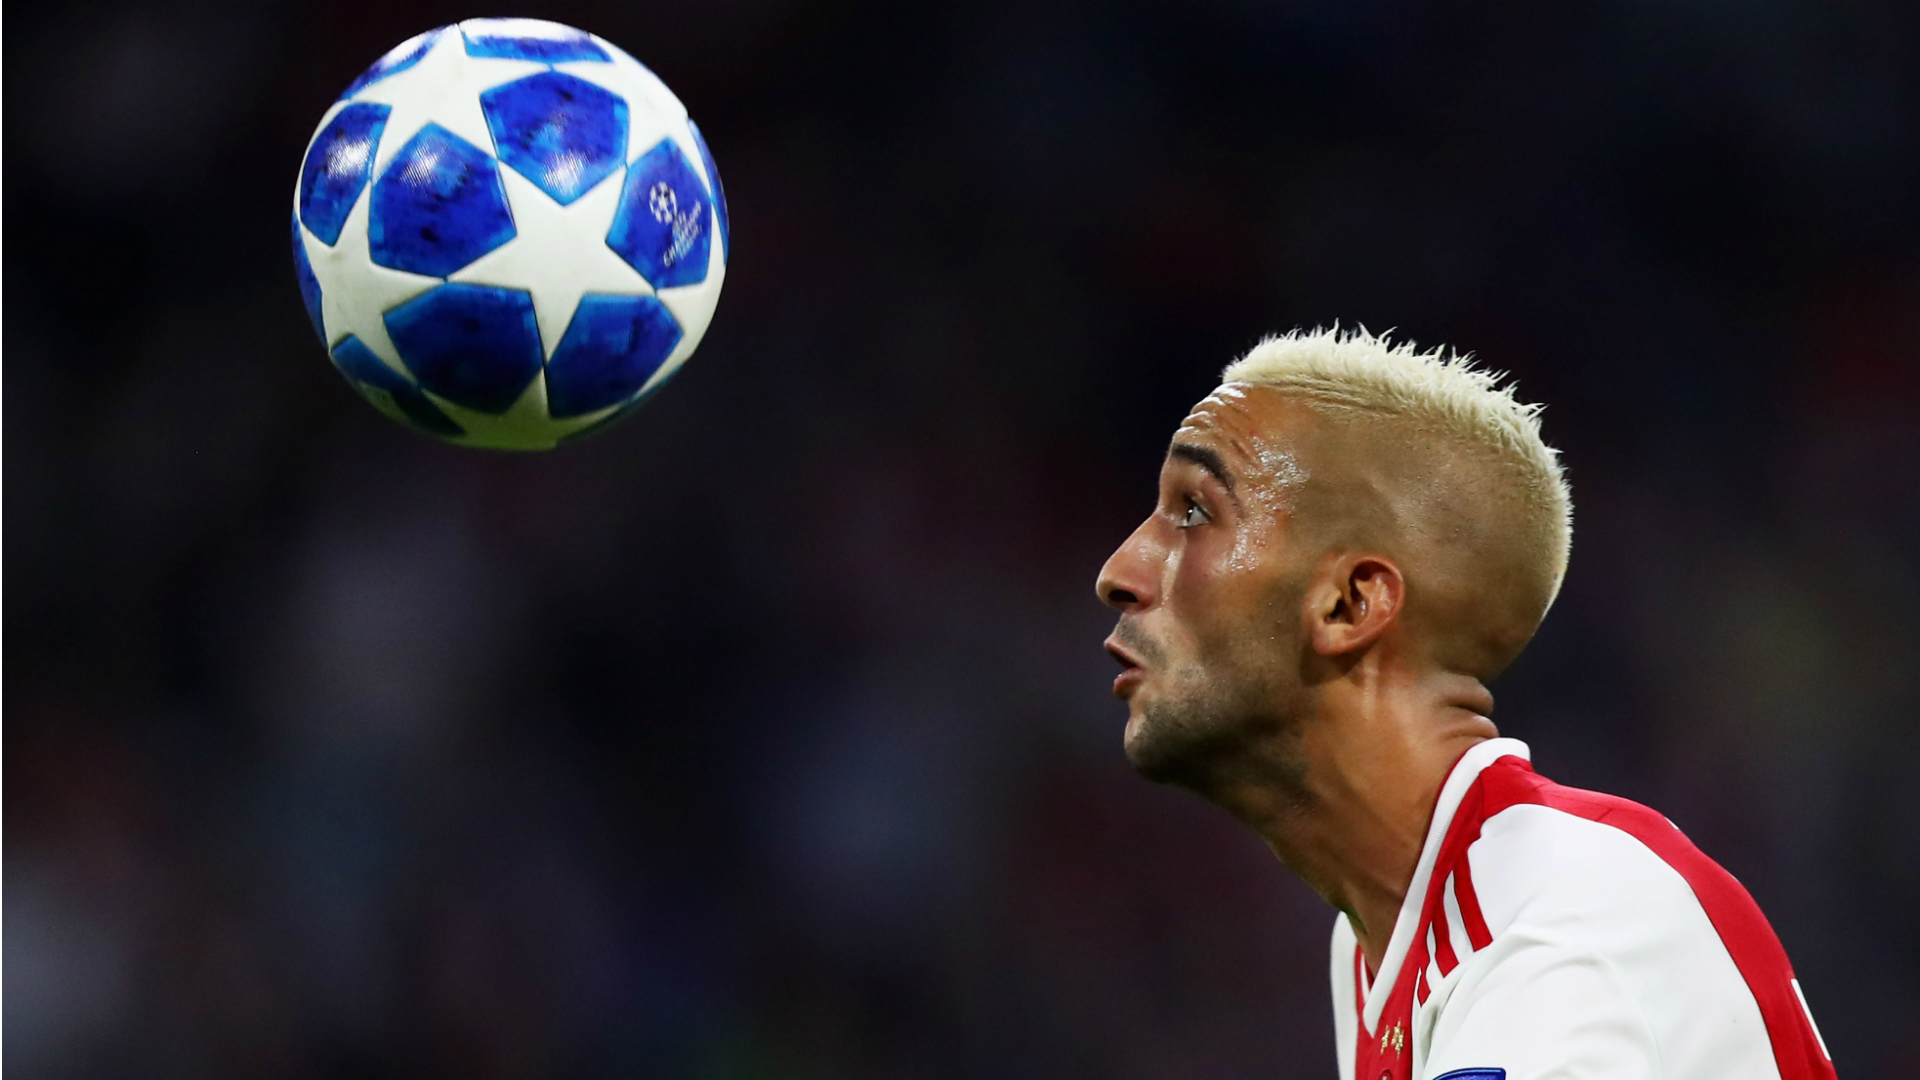 Hakim Ziyech - Ajax vs. Dynamo Kyi, Uefa Champions League playoffs